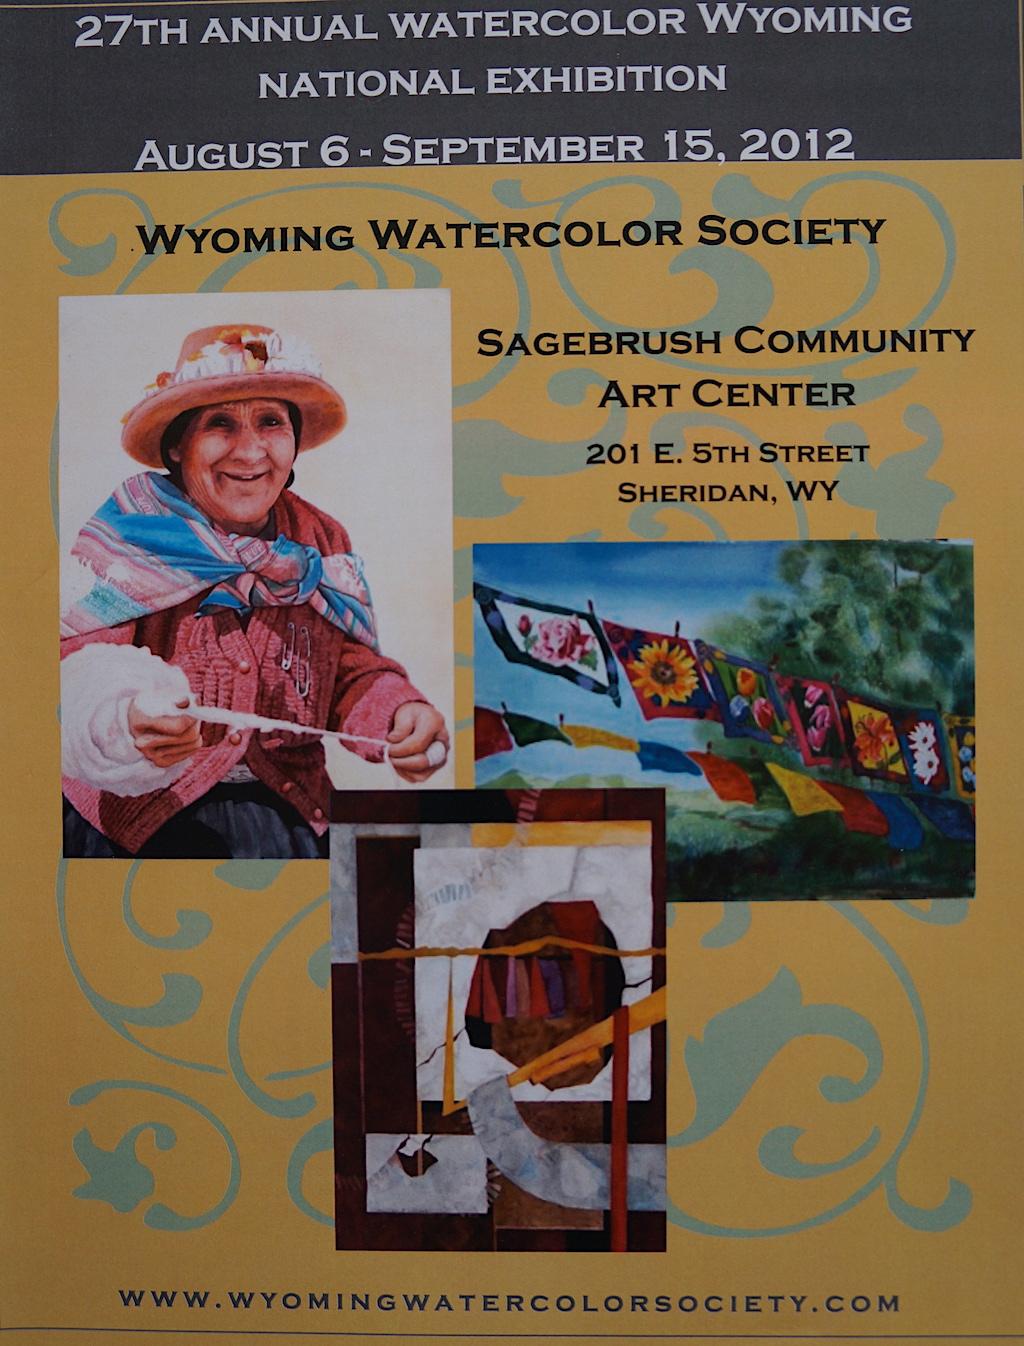 WyomingWS 27th